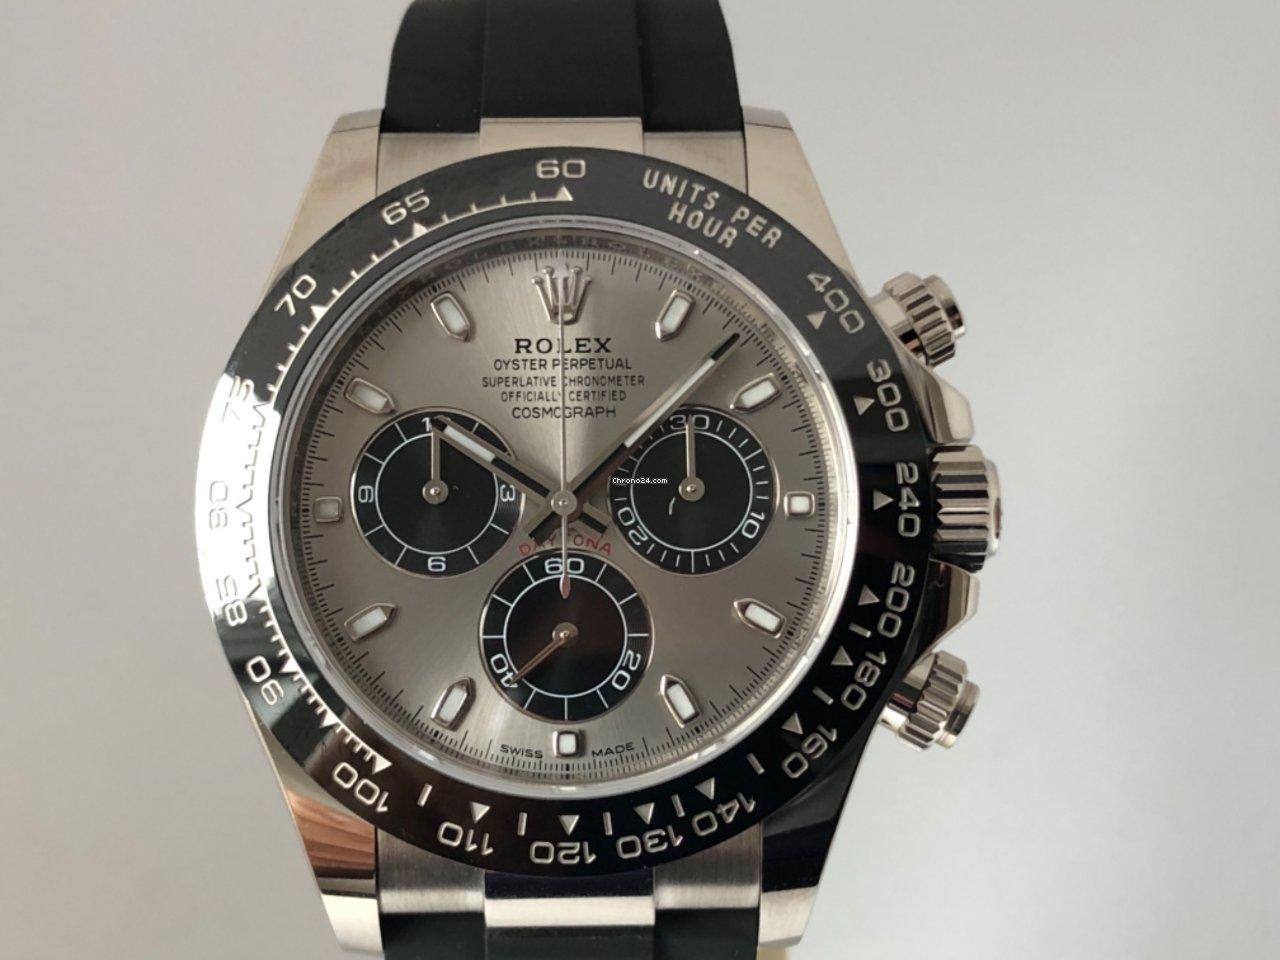 new styles 3fea8 c83d1 Rolex Daytona Weissgold 116519LN